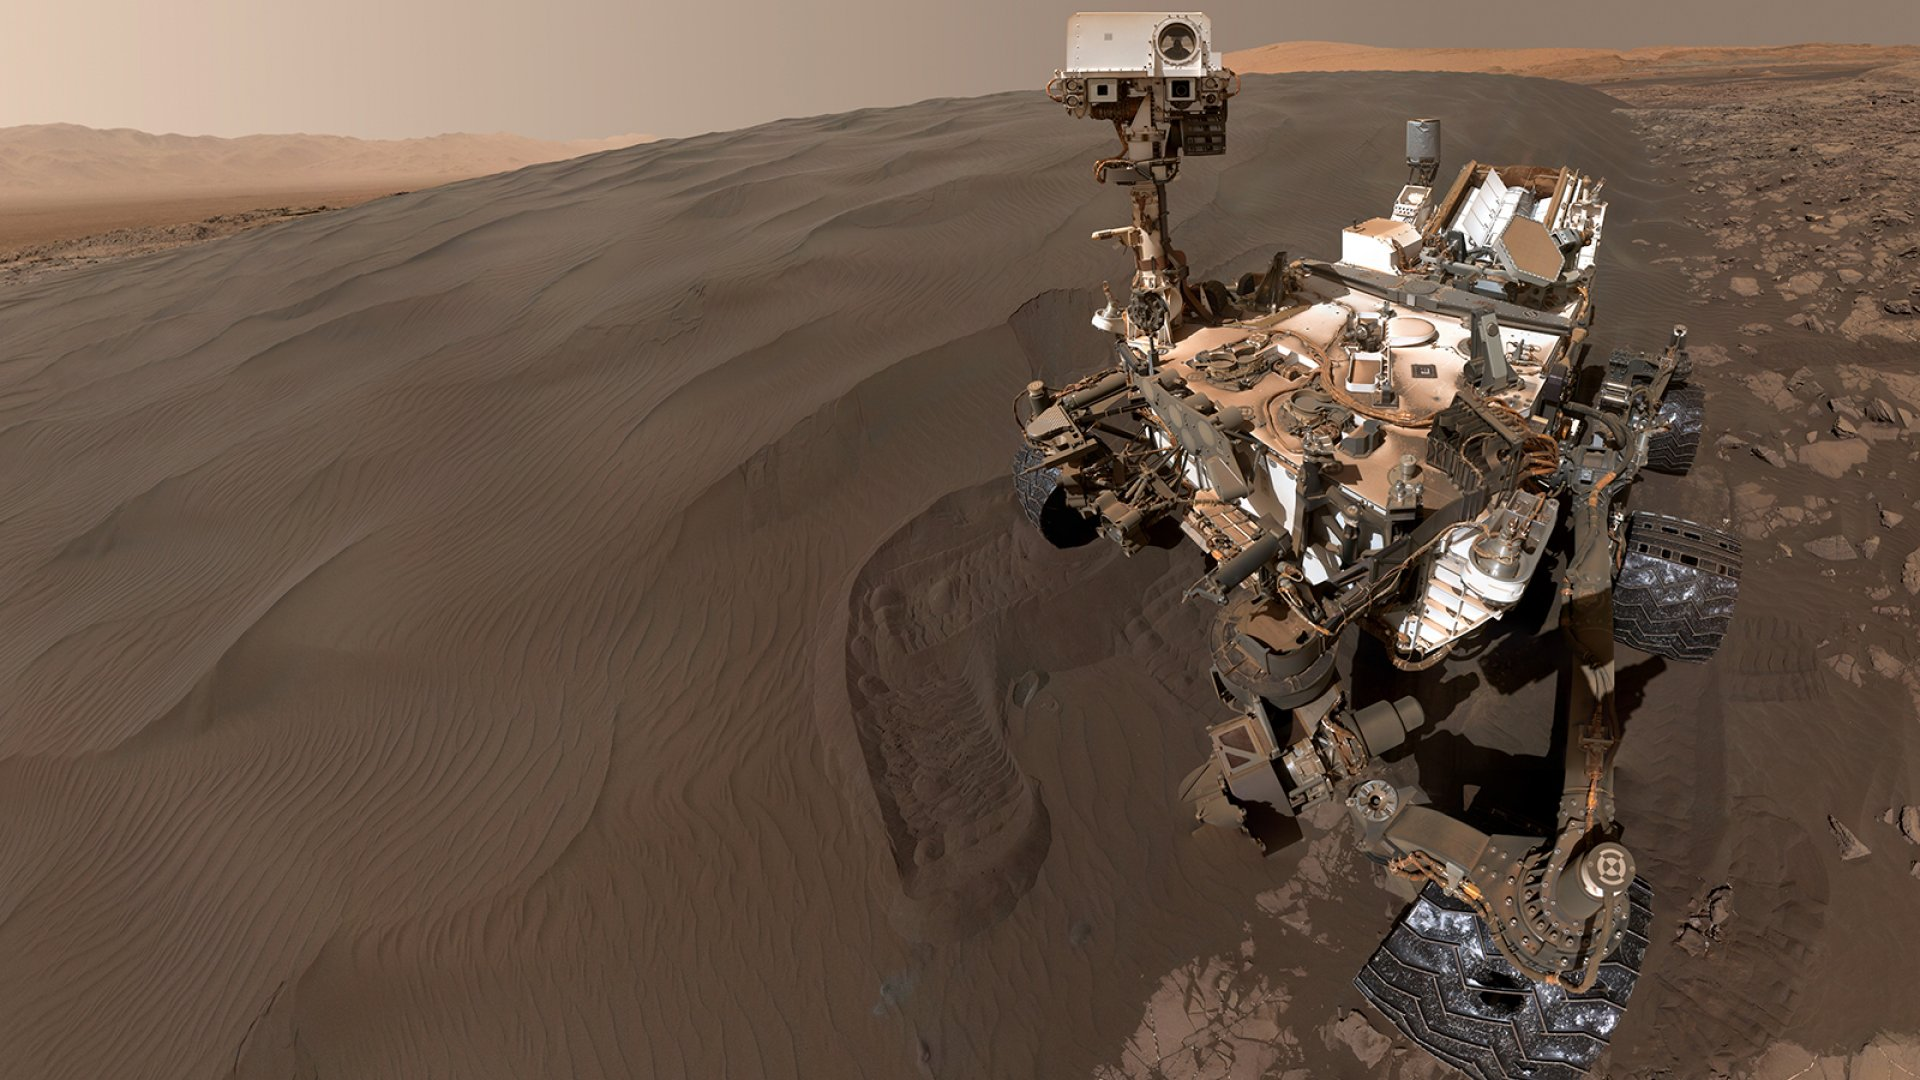 NASA's Curiosity Rover on the surface of Mars.